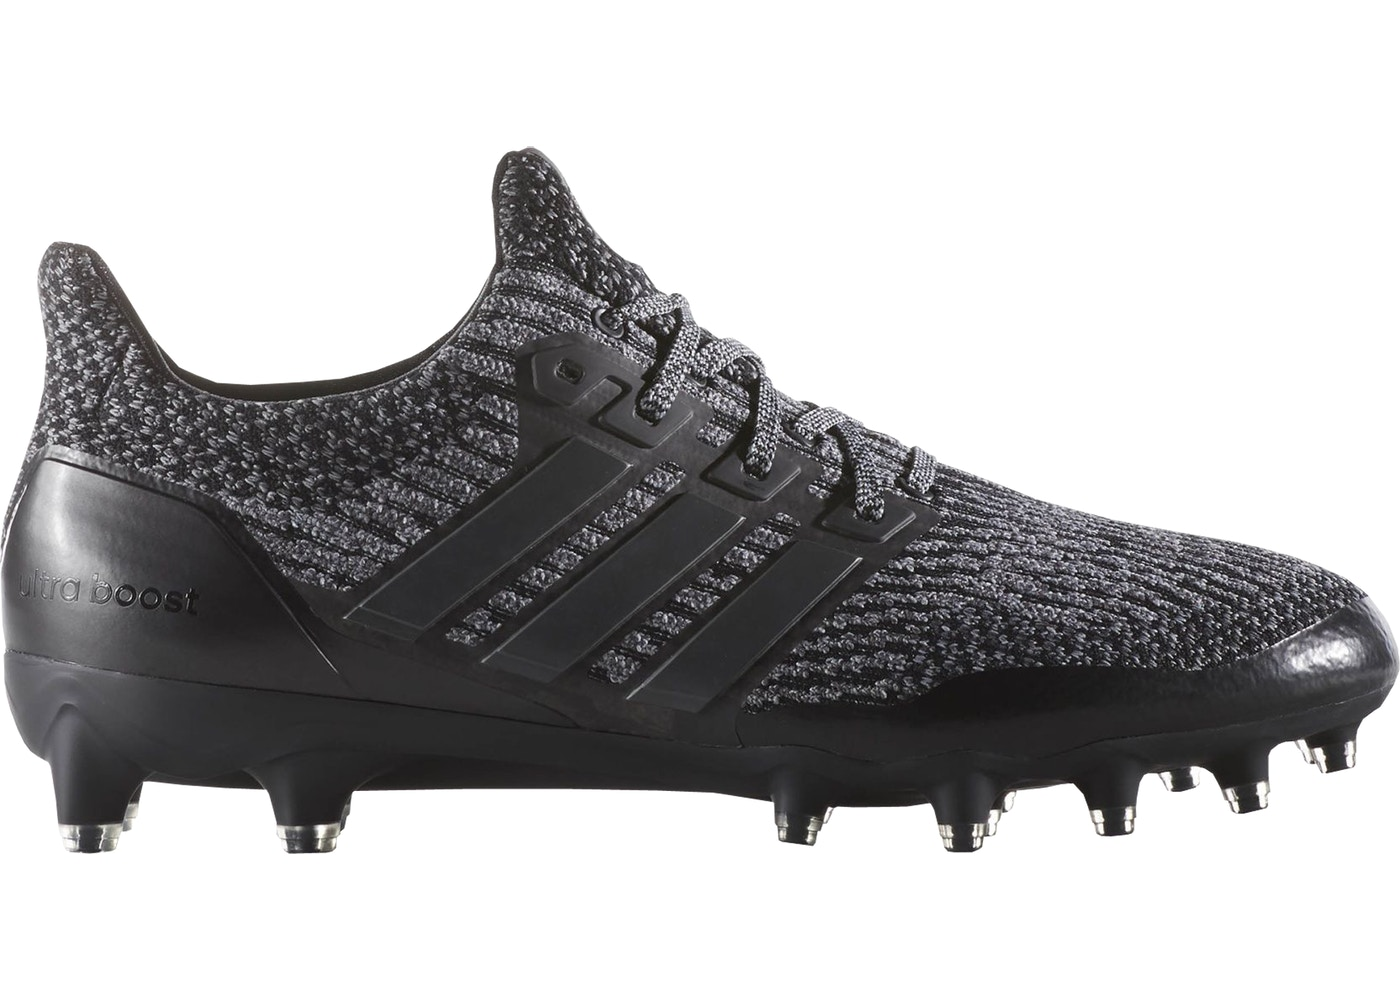 ultra boost adidas football cleats